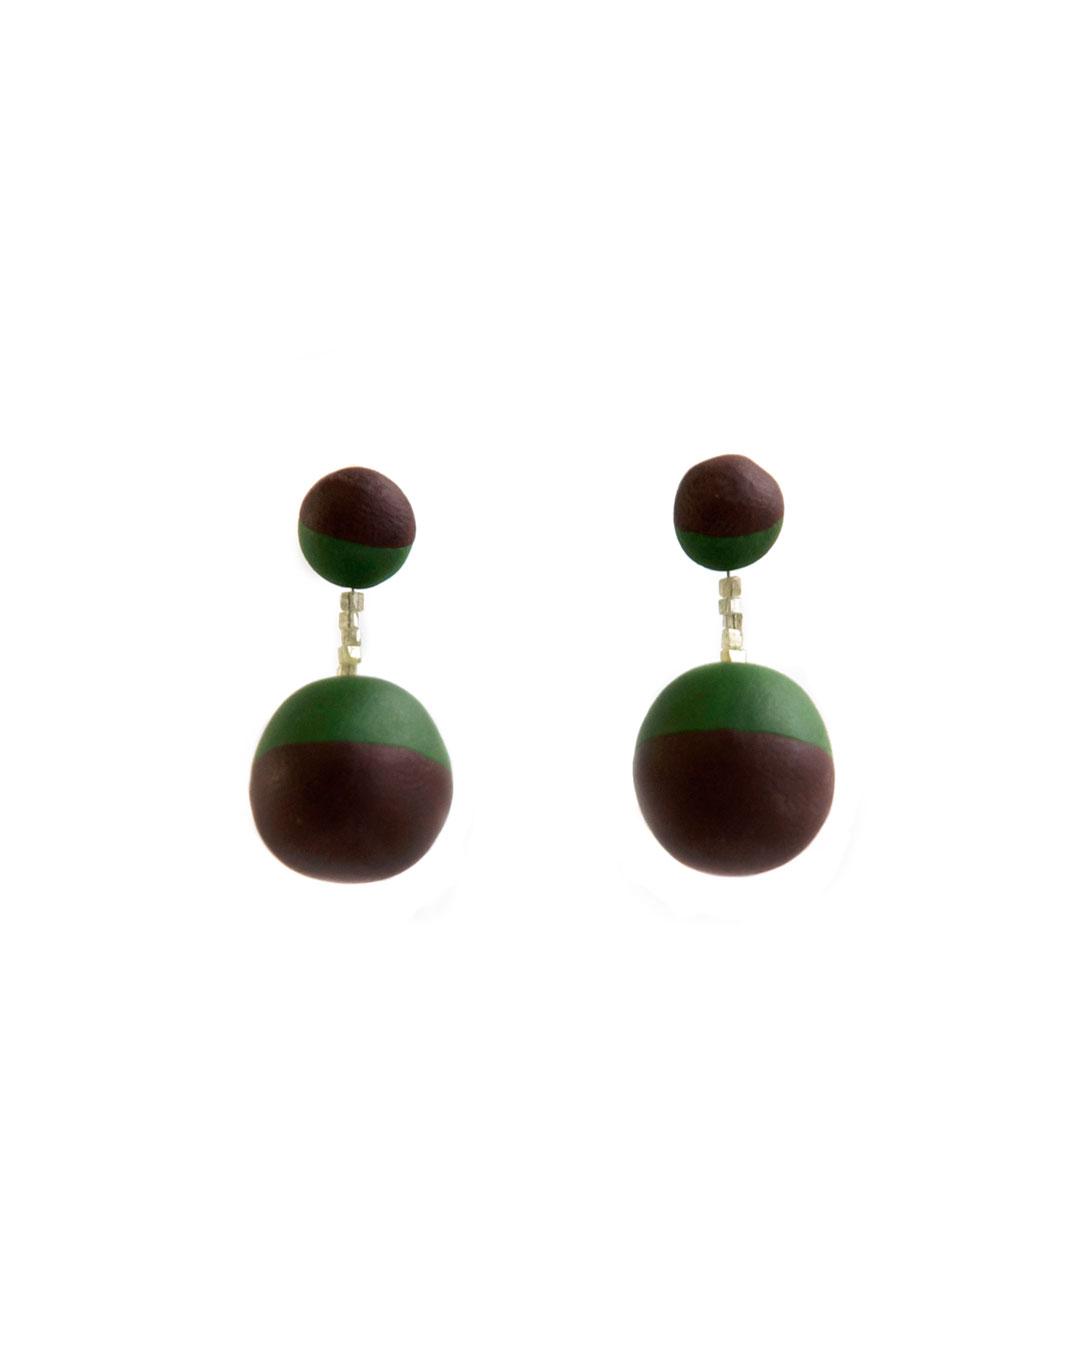 Julie Mollenhauer, untitled, 2011, earrings; Fimo, diamond, silver, plastic, 30 x 15 x 15 mm, €330